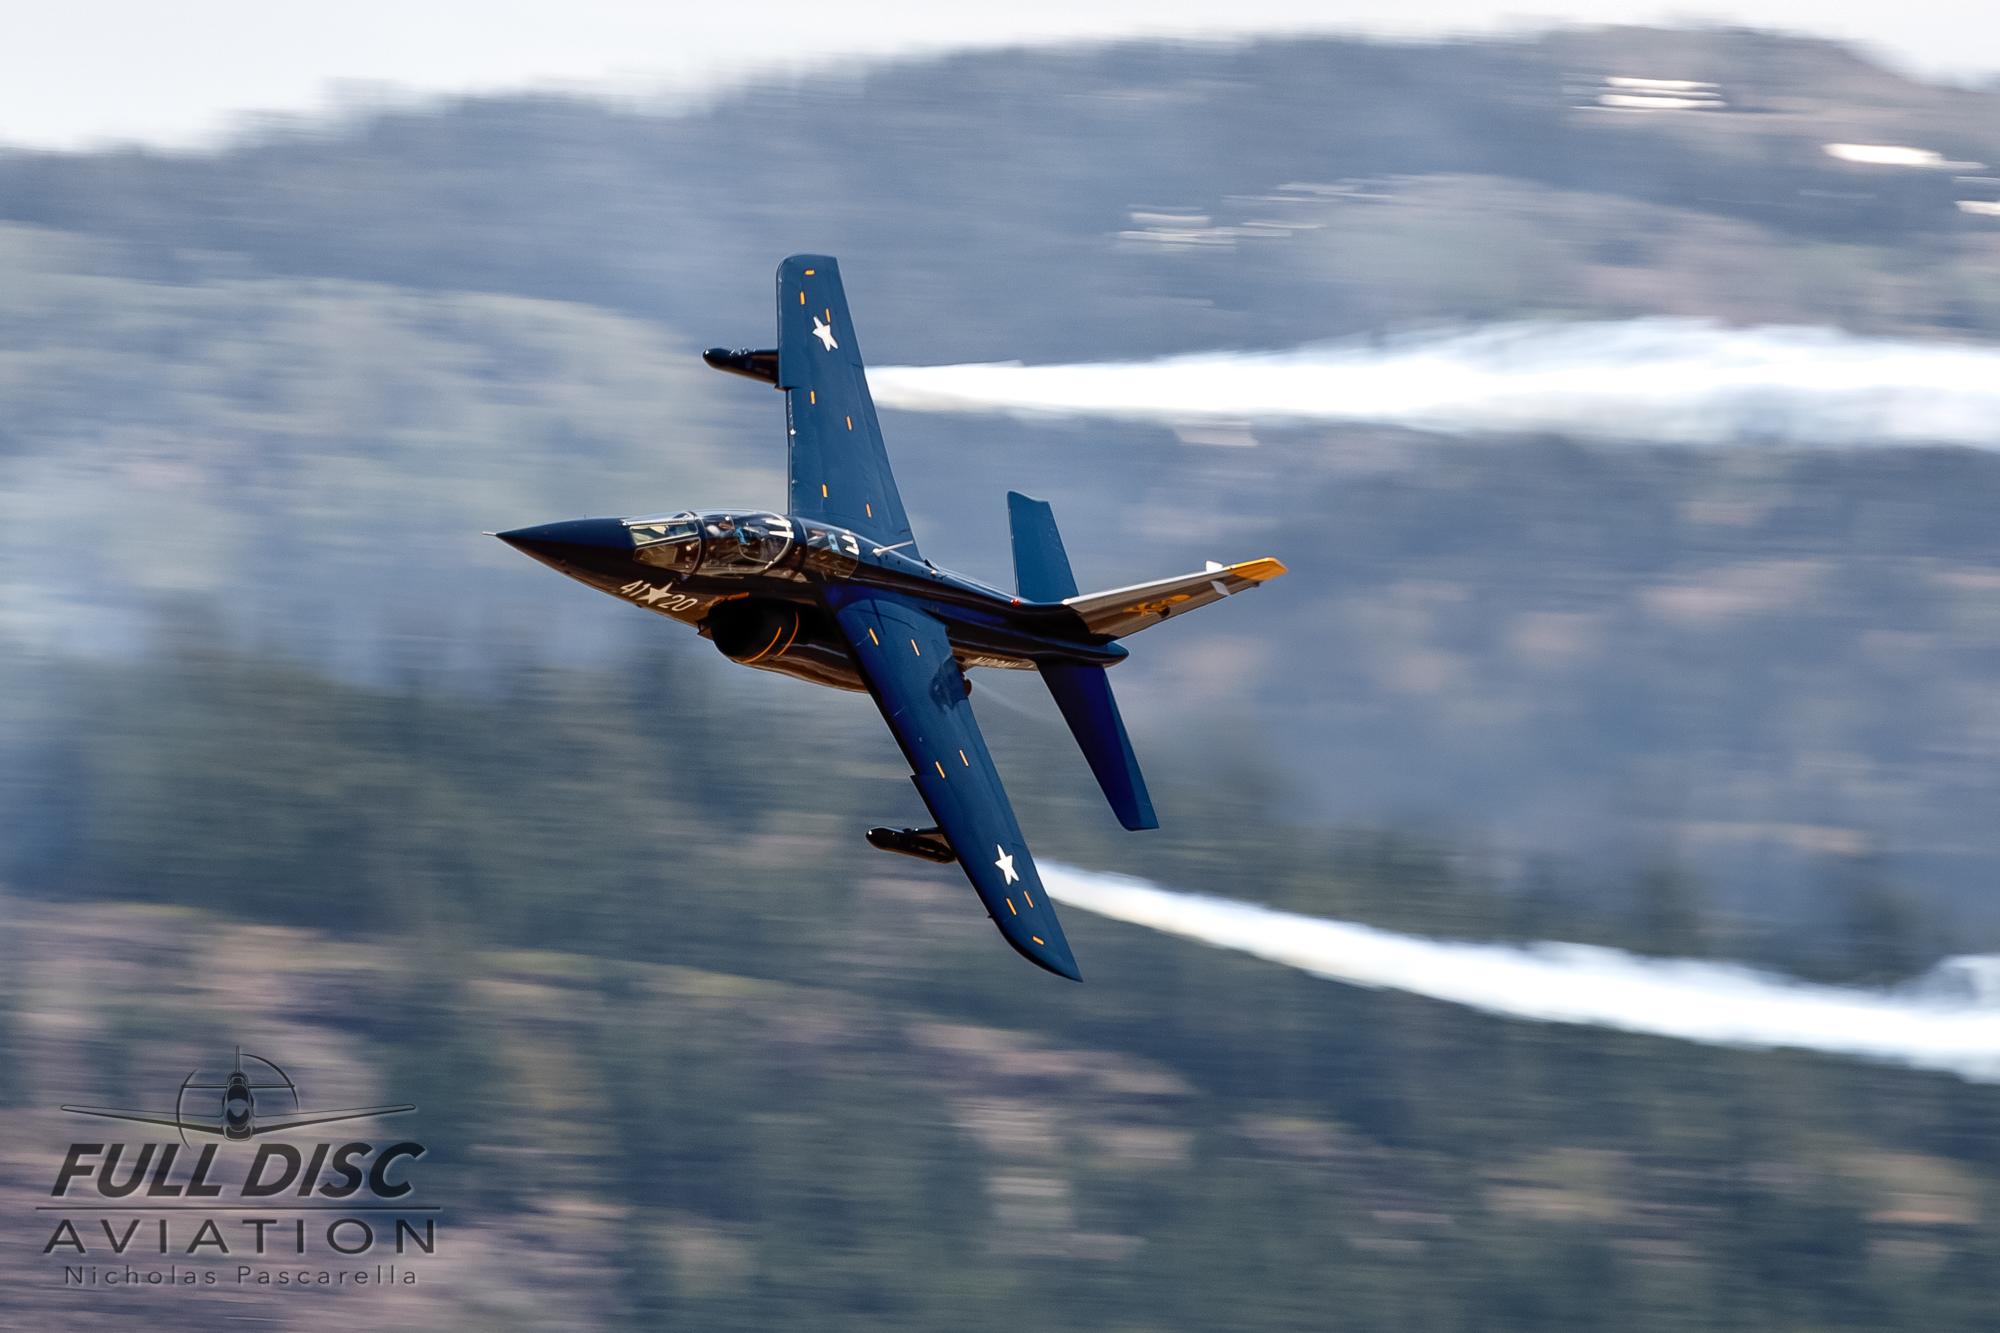 nickpascarella_nicholaspascarella_fulldiscaviation_aircraft_alphajet.jpg